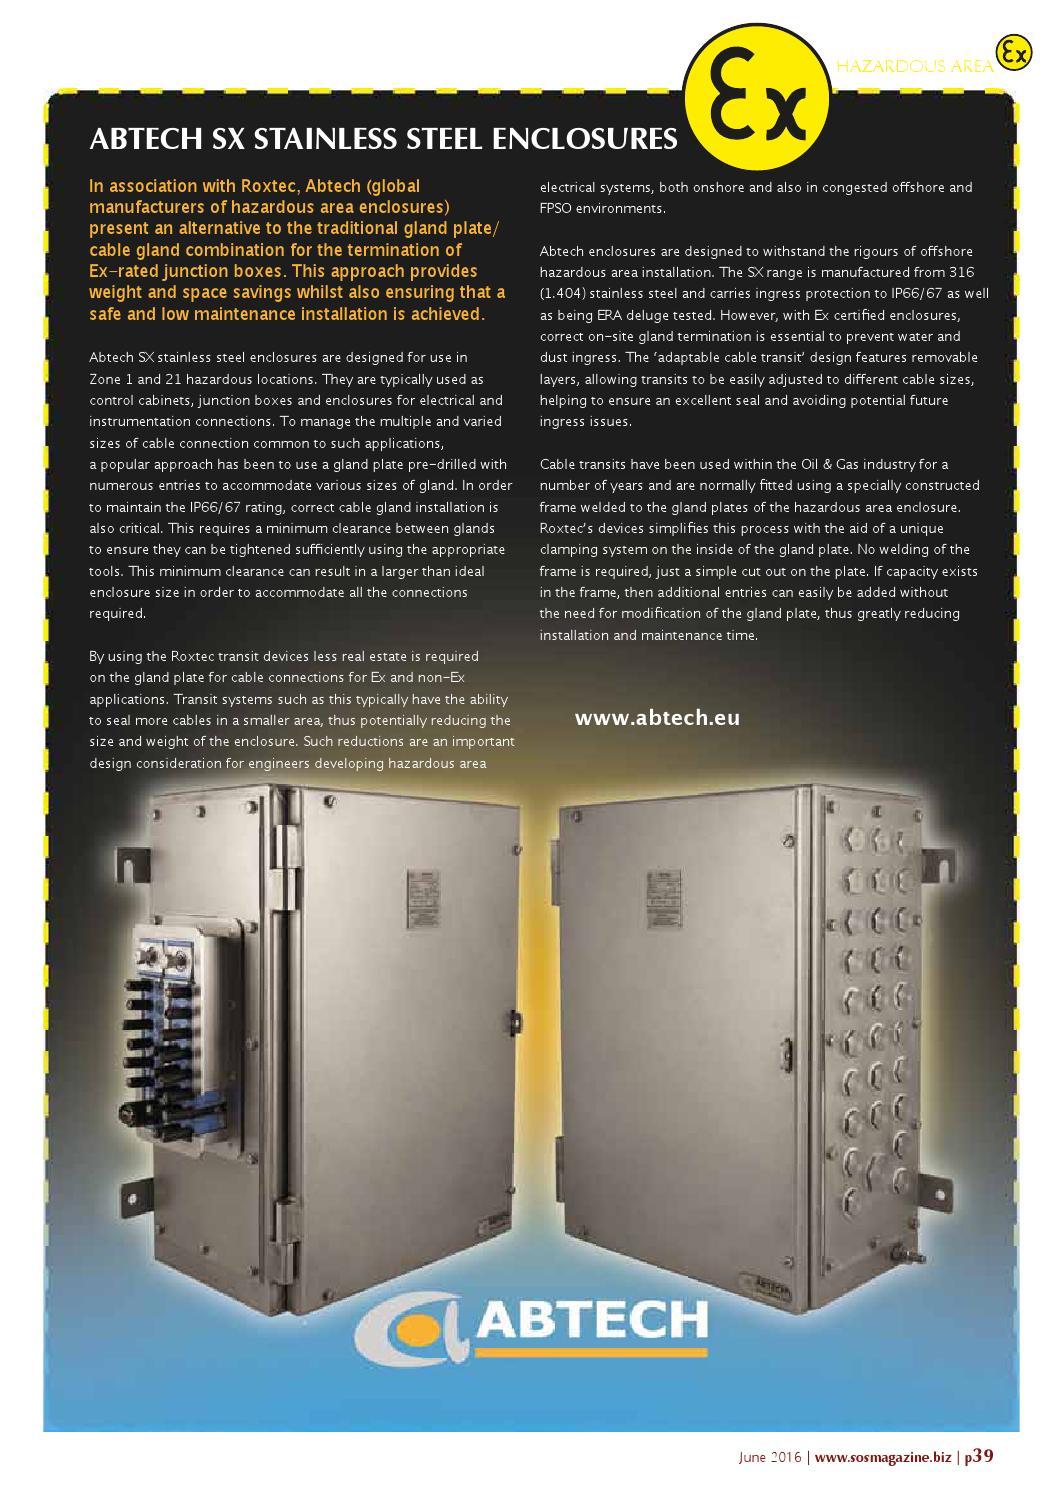 Subsea & Offshore Magazine June 2016 by sosmagazine biz - issuu